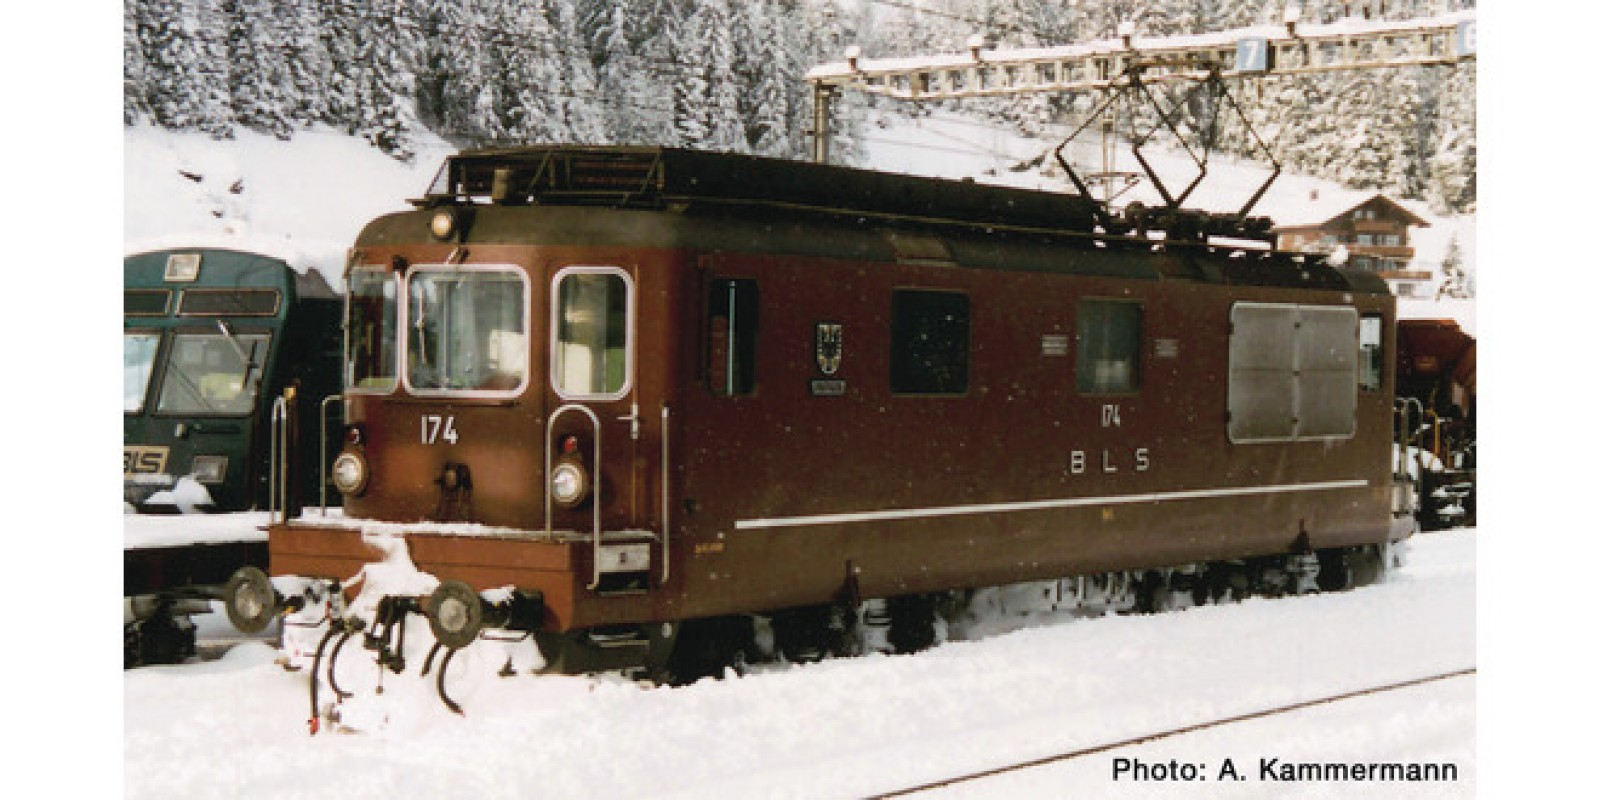 RO79781 - Electric locomotive Re 4/4, BLS